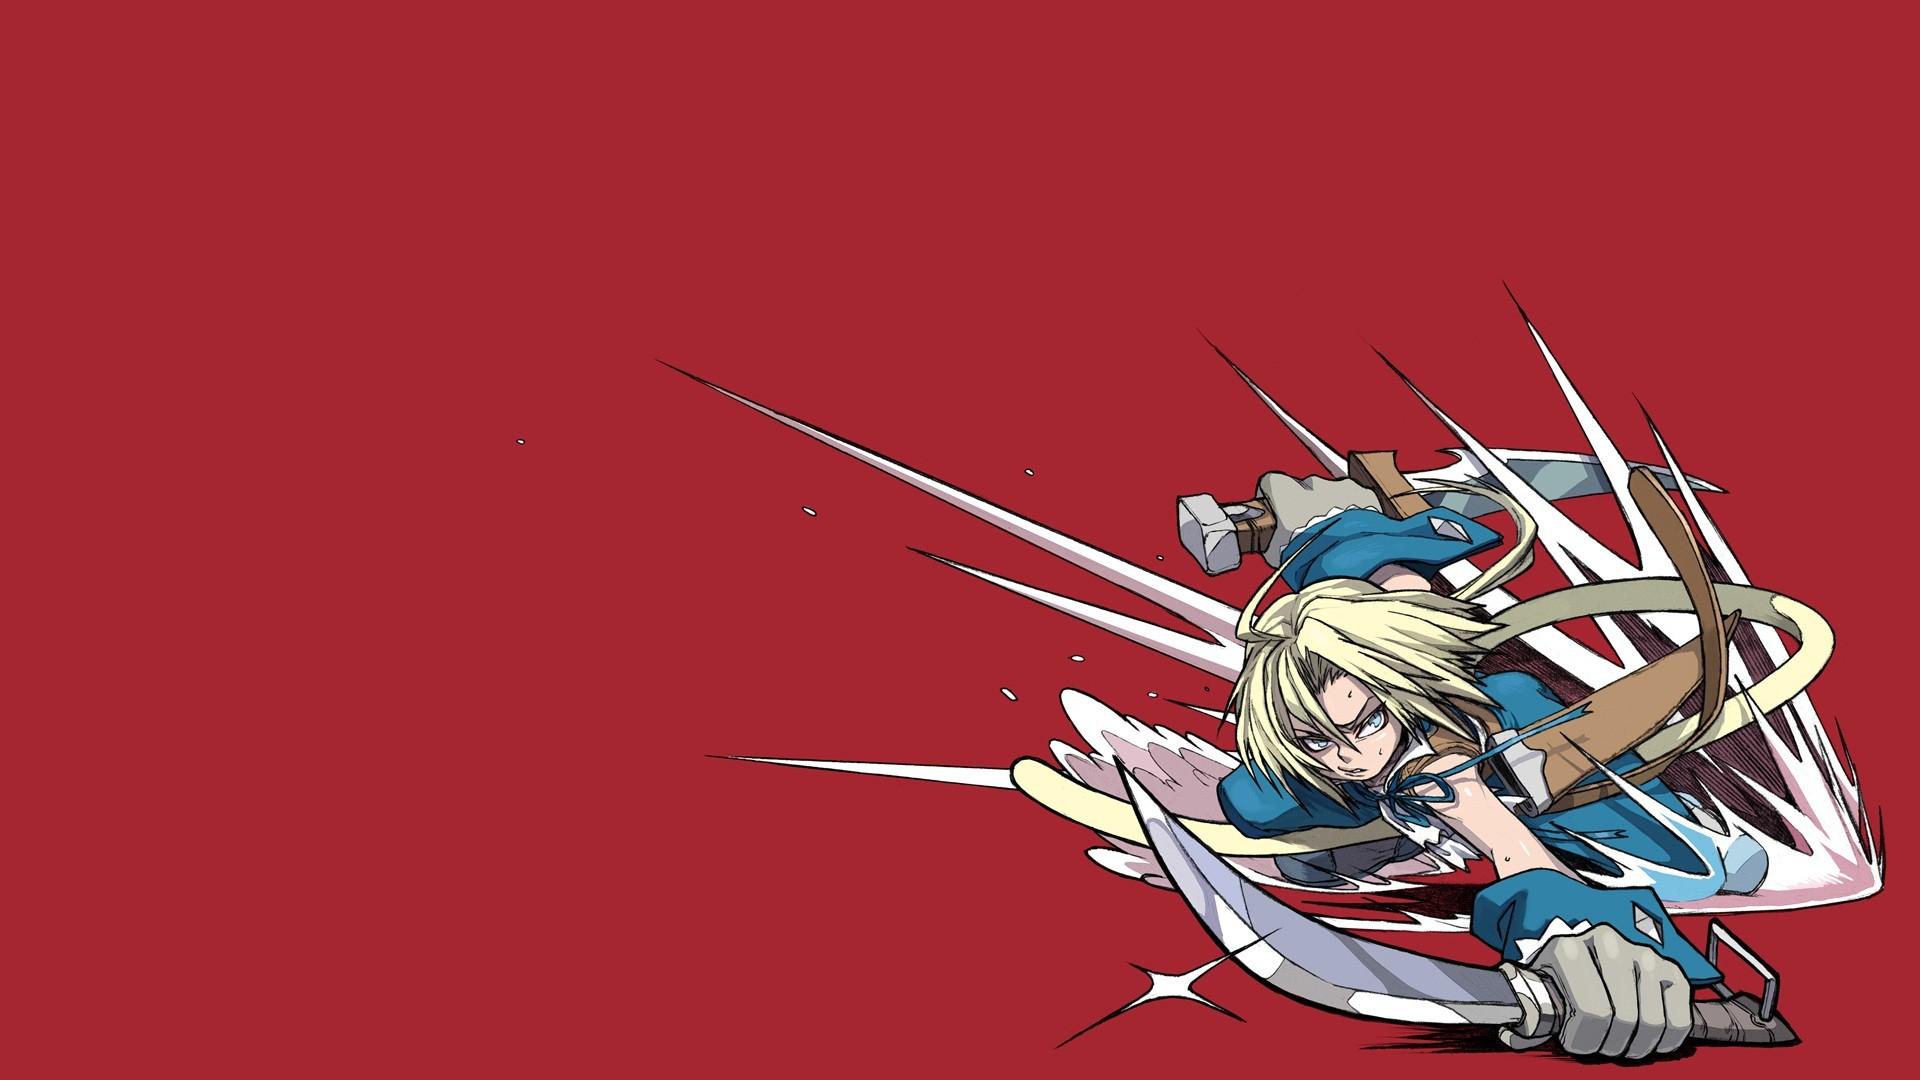 Tails video games Final Fantasy IX daggers Zidane Tribal wallpaper | 1920x1080 | 210005 | WallpaperUP